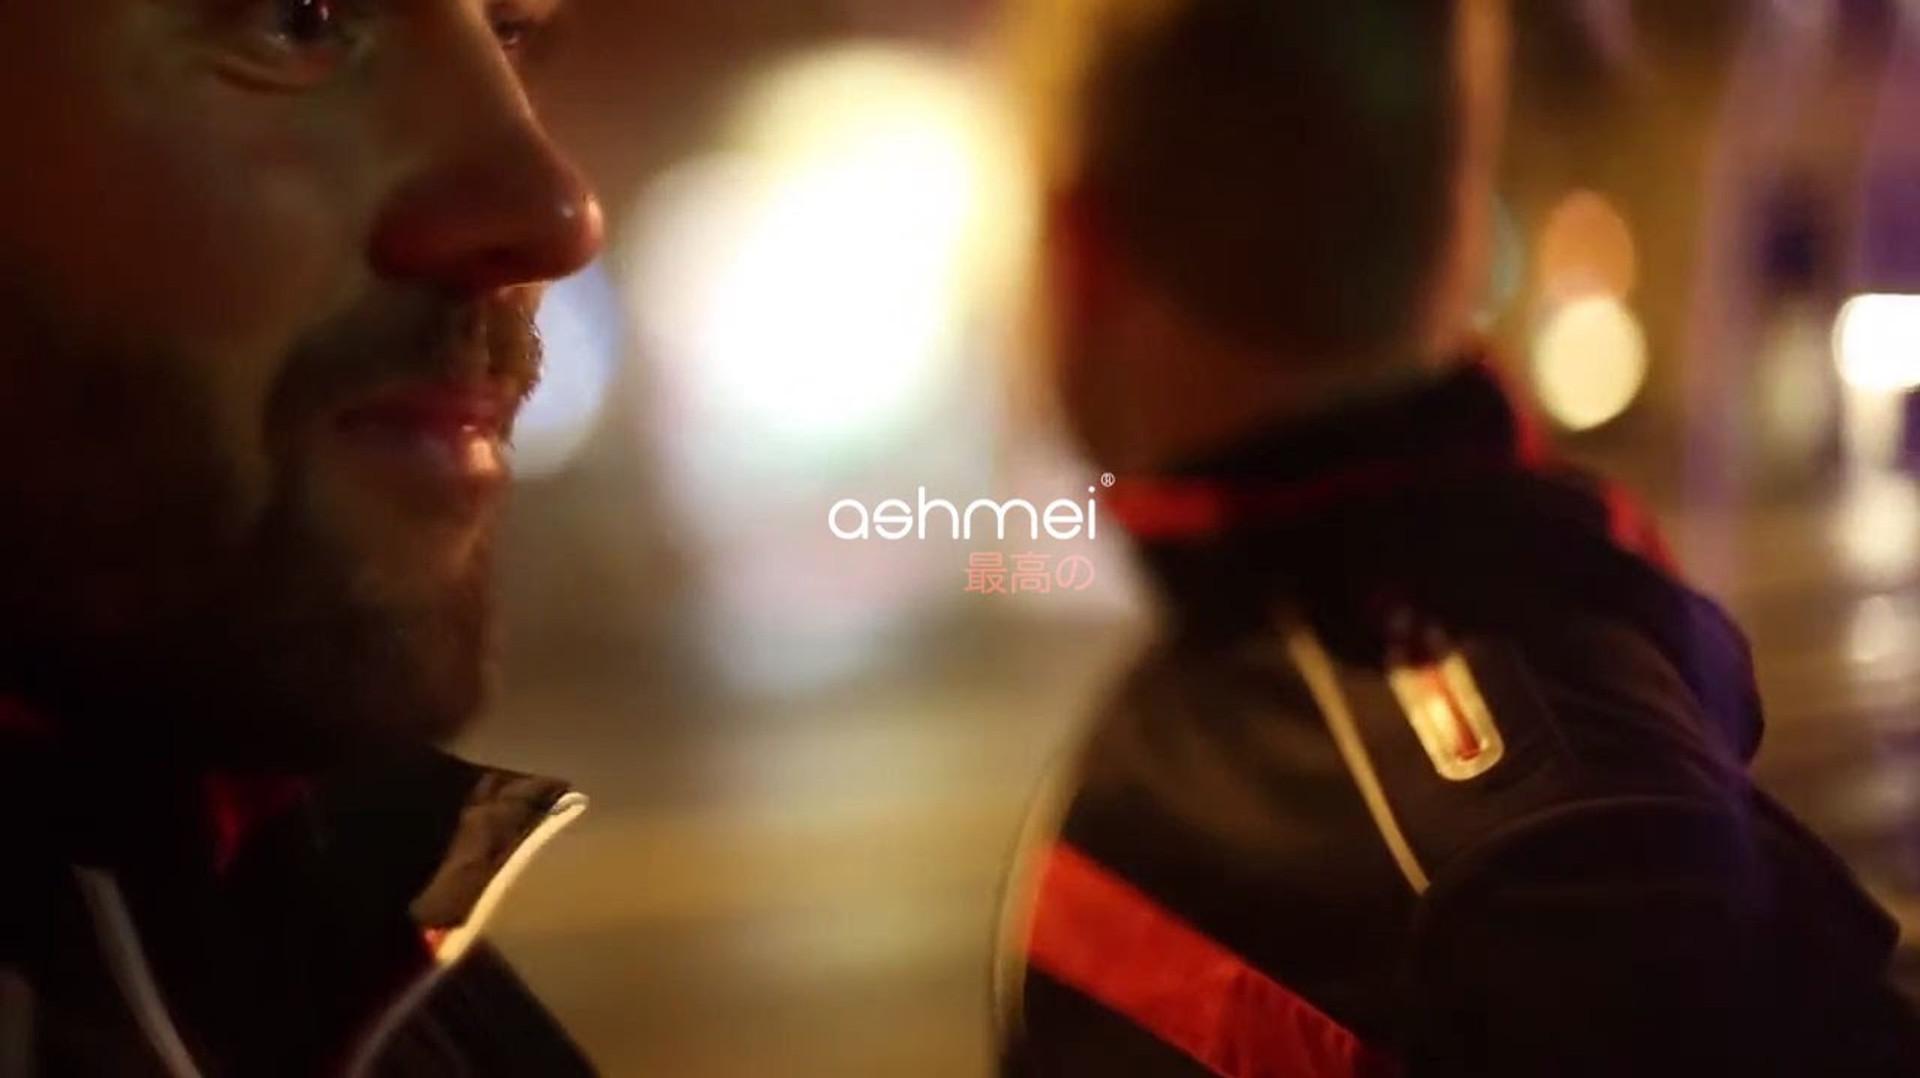 ashmei - Running wear